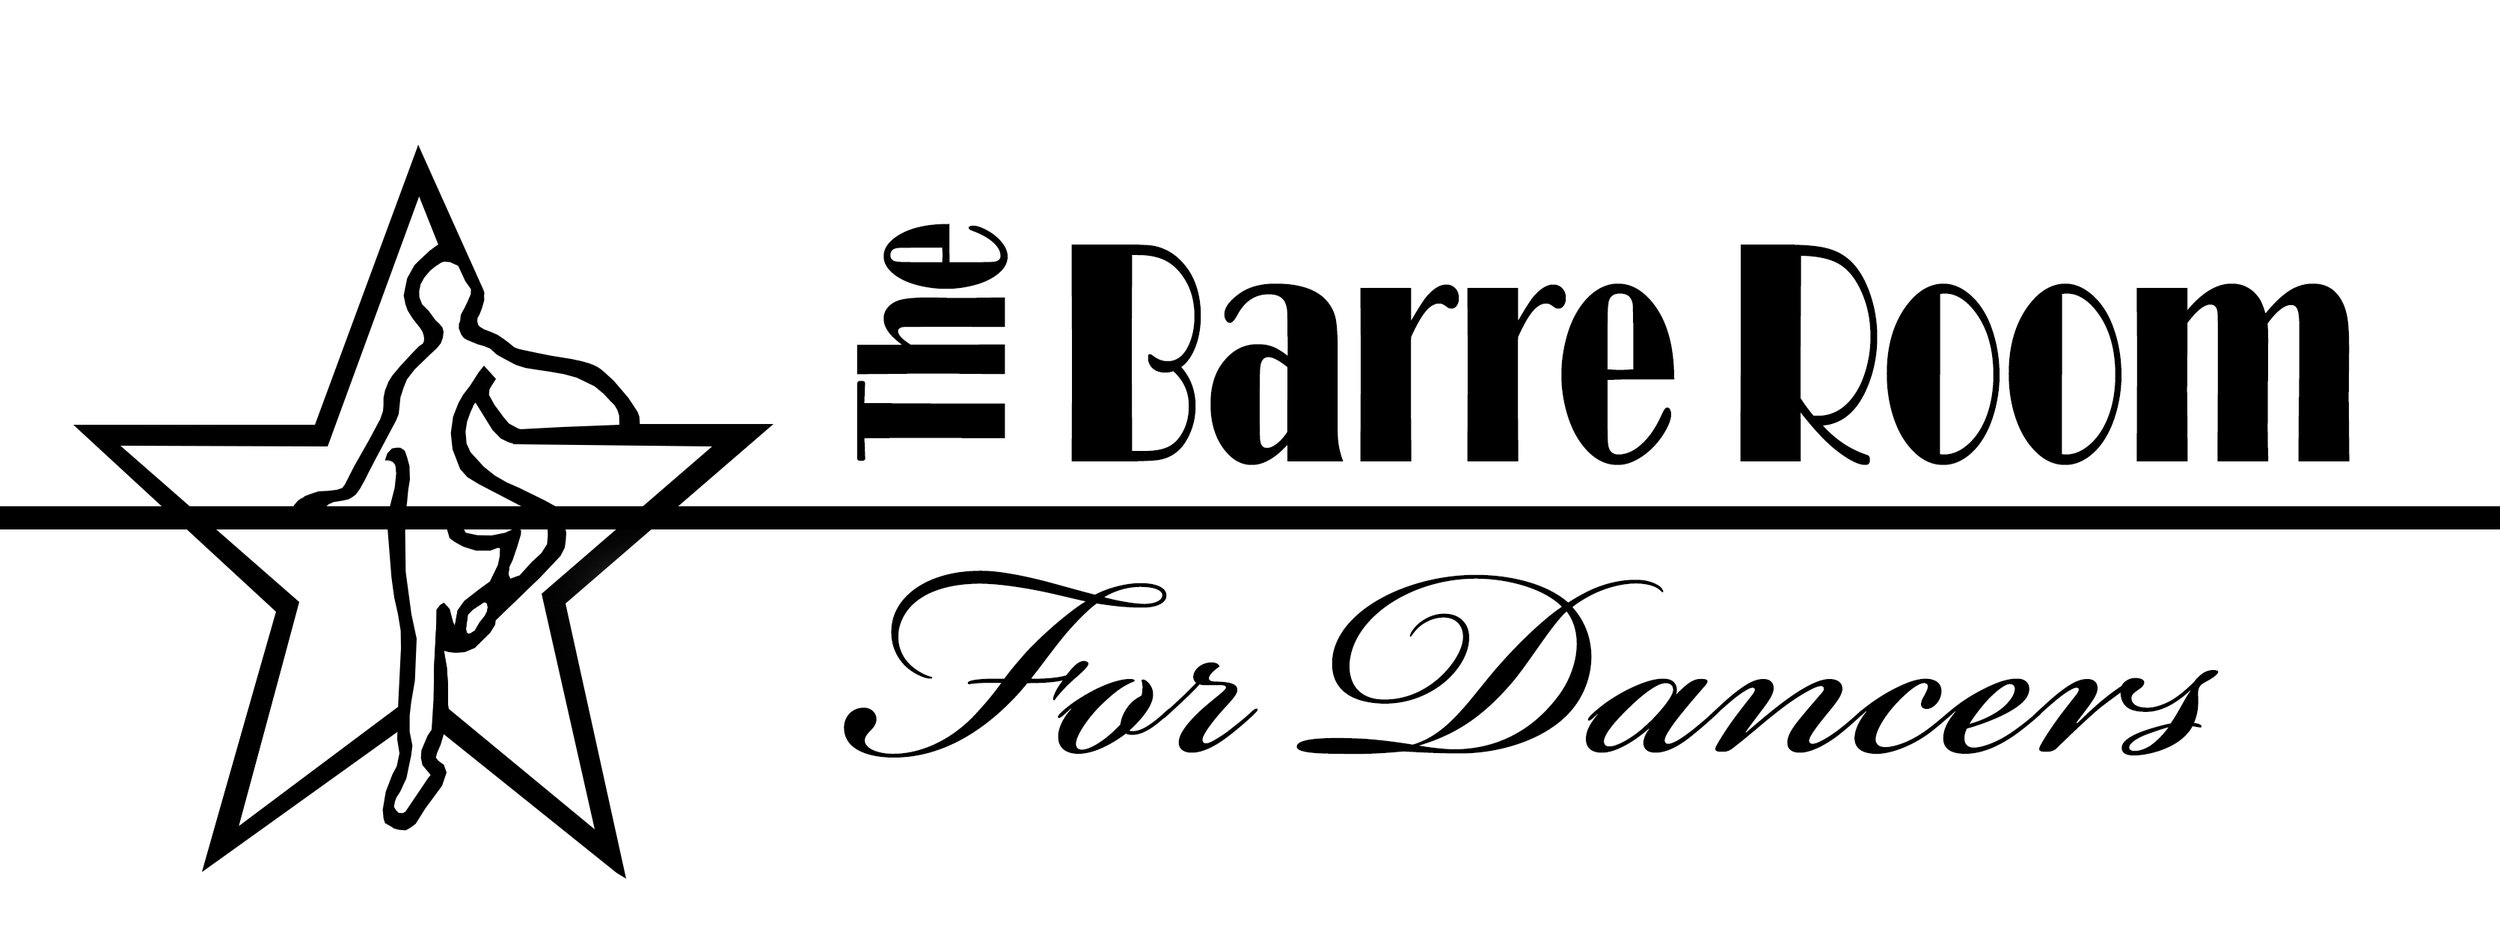 Barre room logo NEW.jpg